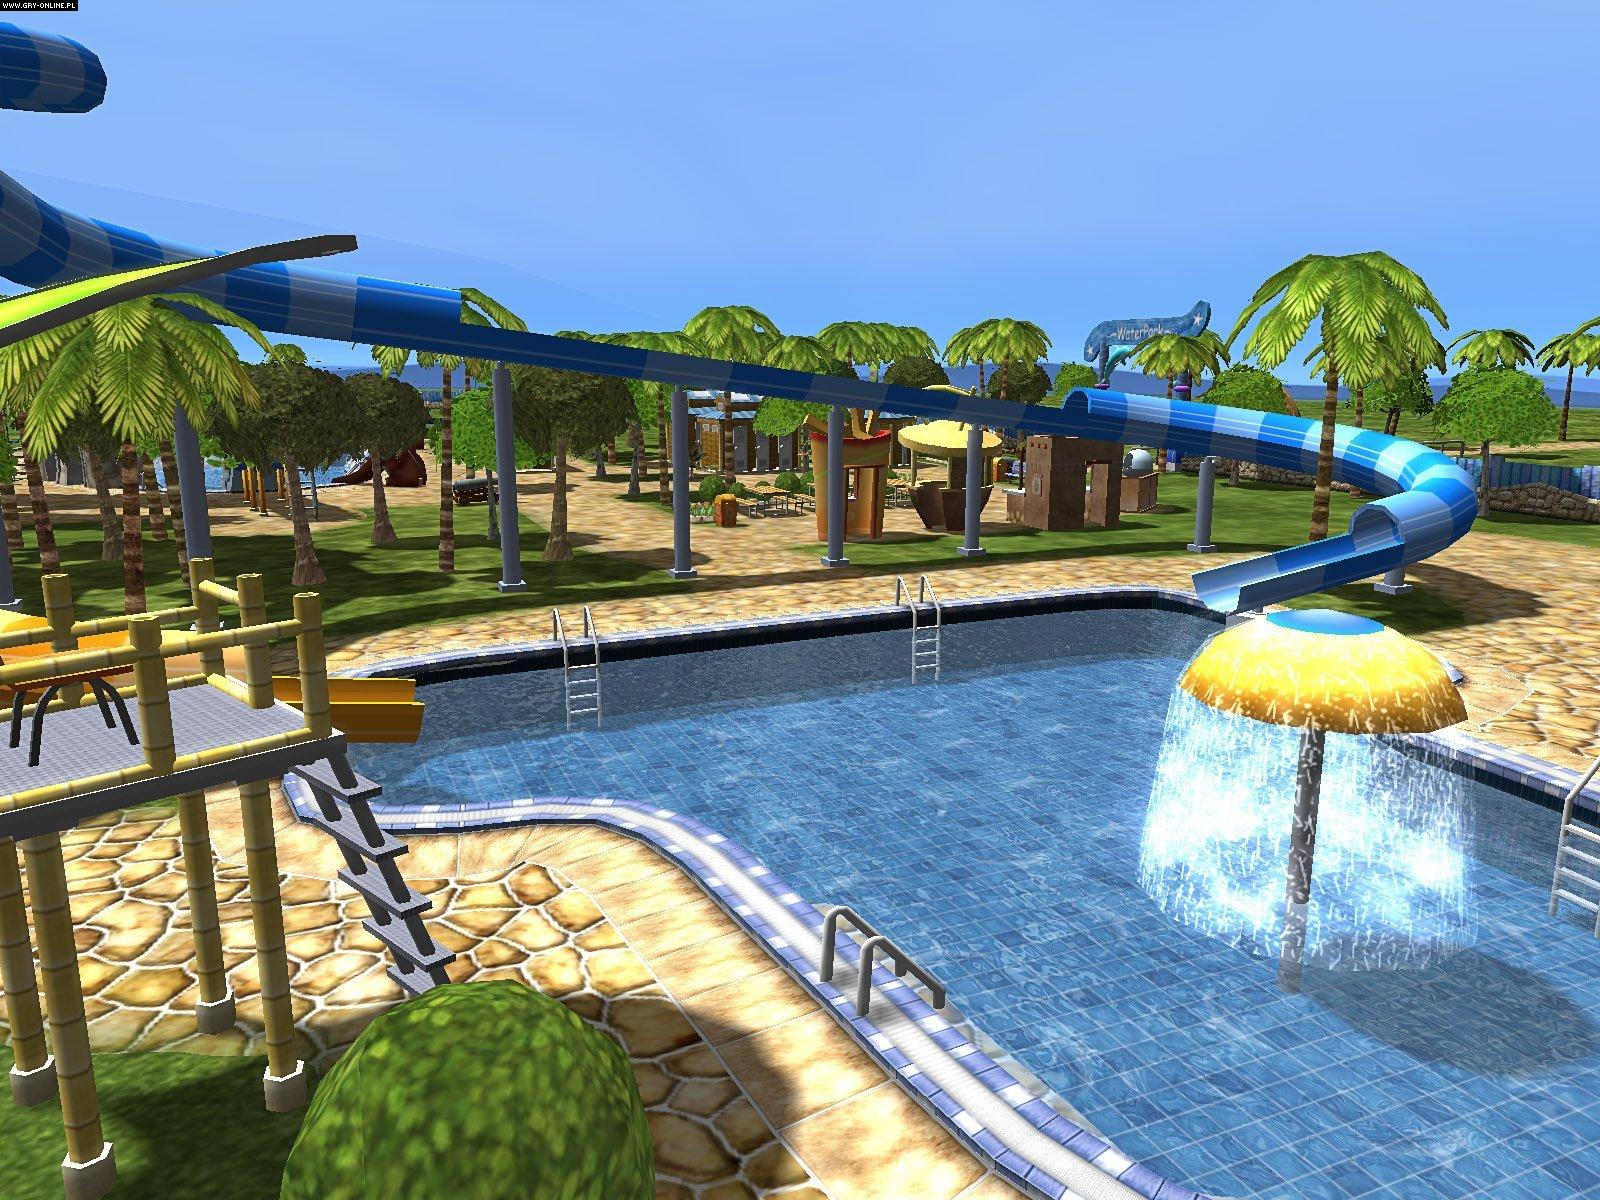 Water Park Tycoon - screenshots gallery - screenshot 4/6